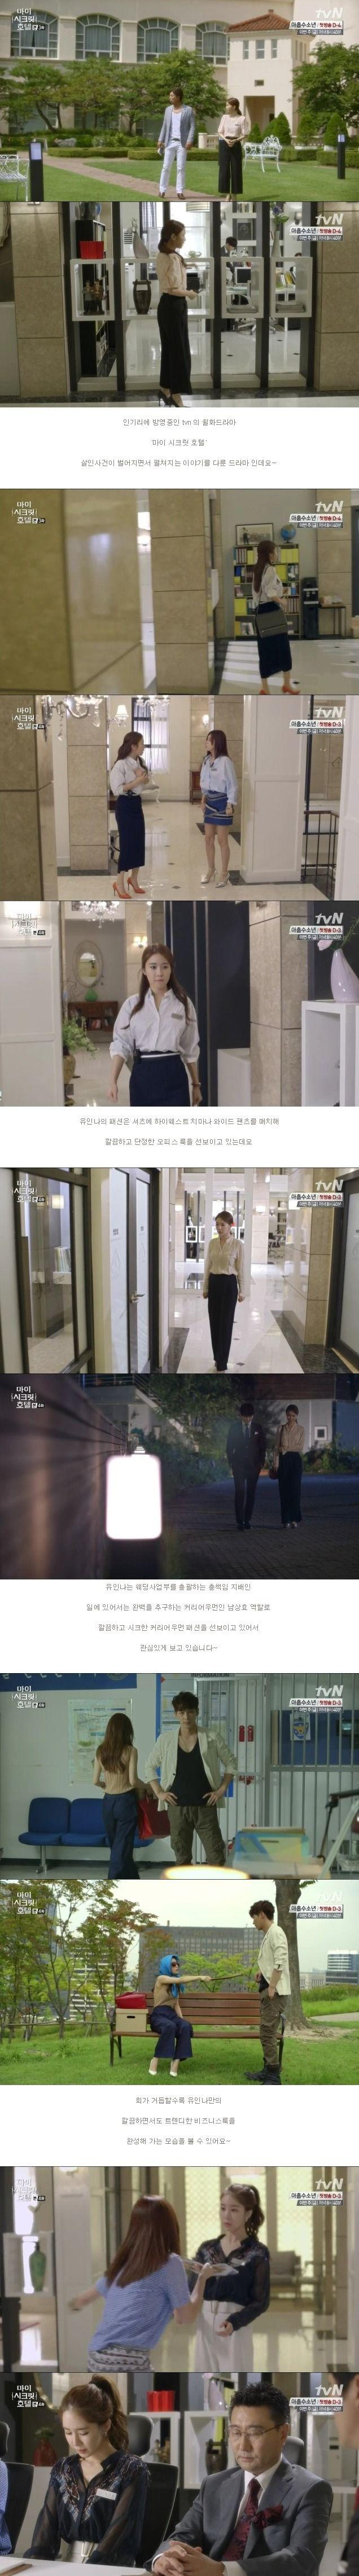 My Secret Hotel (마이 시크릿 호텔) Korean - Drama - Episode 4 - Picture @ HanCinema :: The Korean Movie and Drama Database